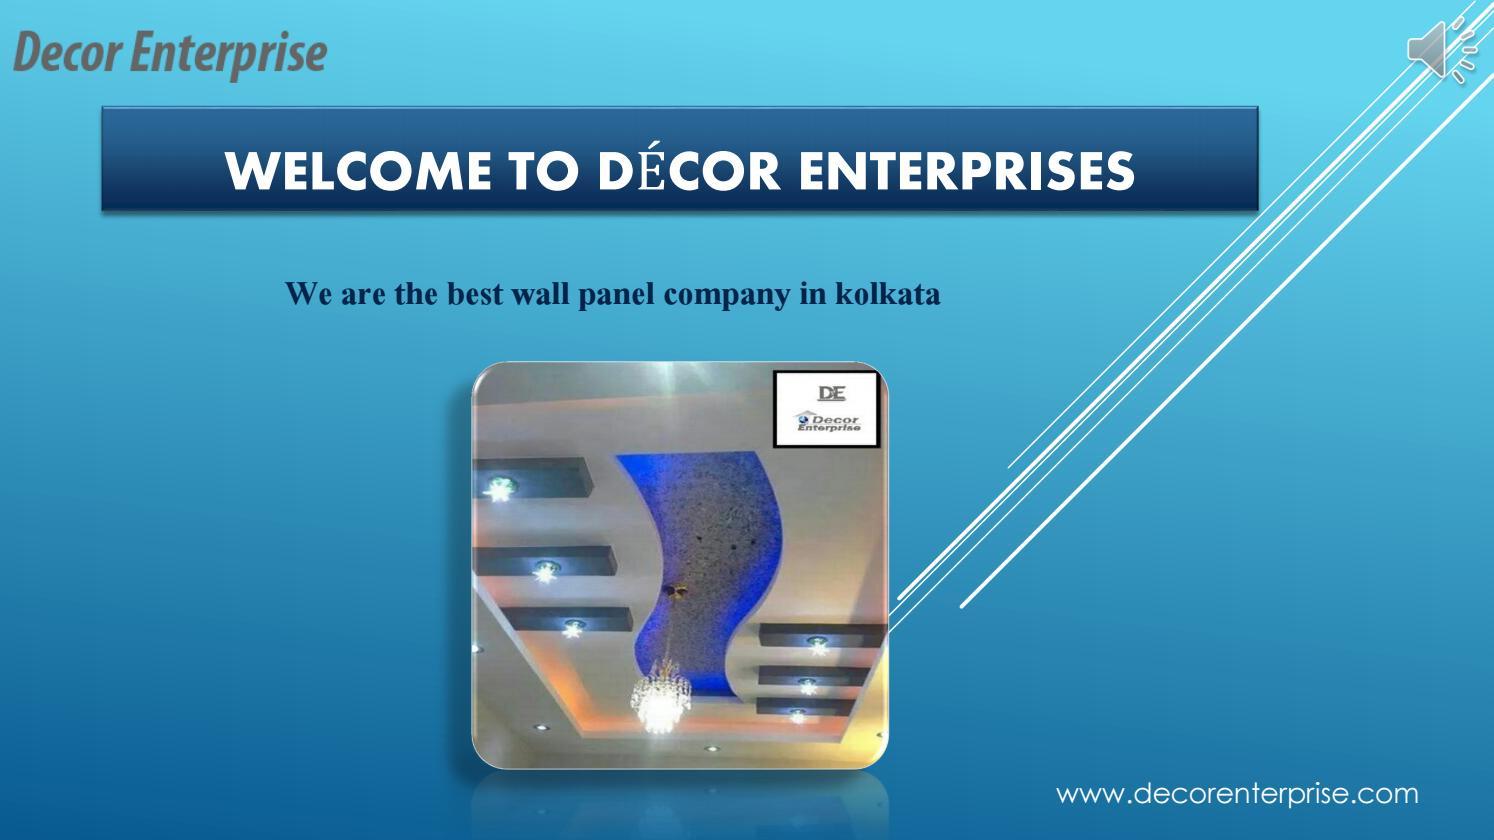 Top Wall Panel Company In Kolkata Decor Enterprises By Decor